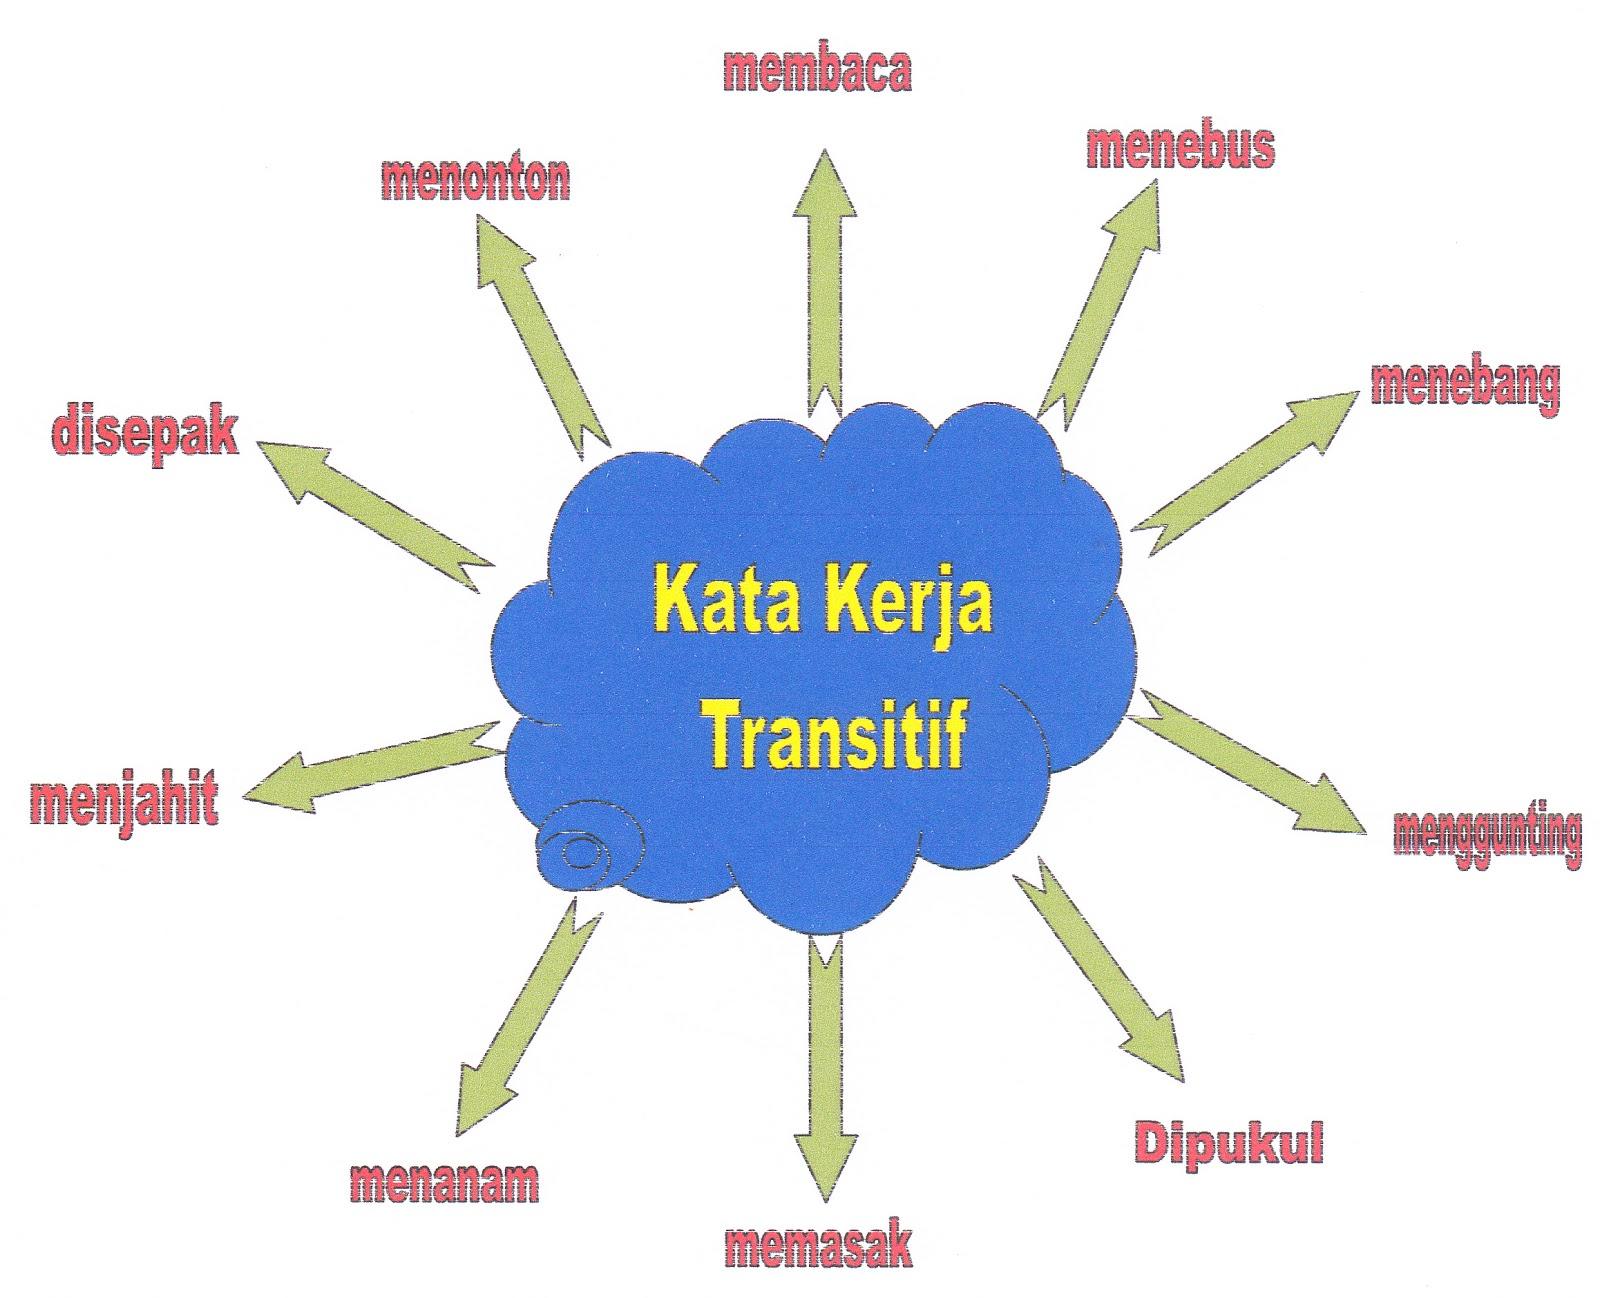 Suzana Abd Shukor D20112054808 Peta Minda Bagi Kata Kerja Bahasa Melayu